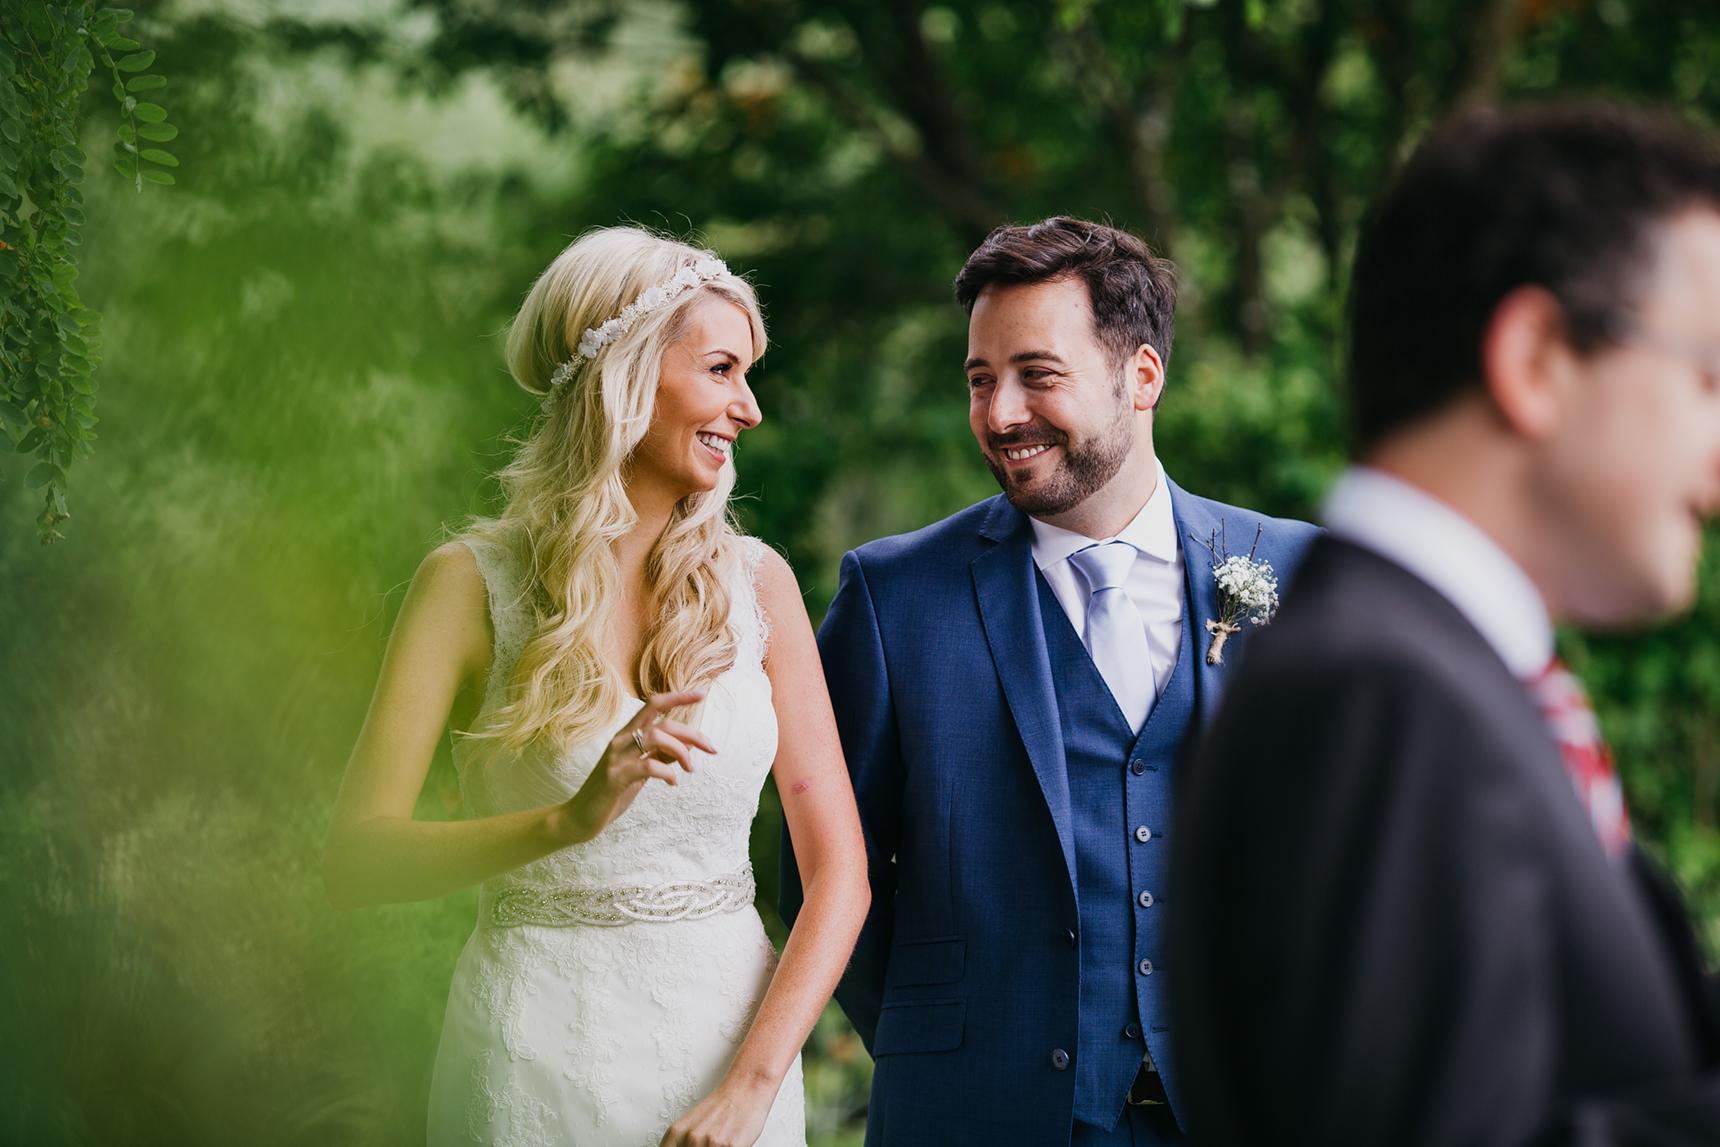 Stratford-upon-Avon wedding photography